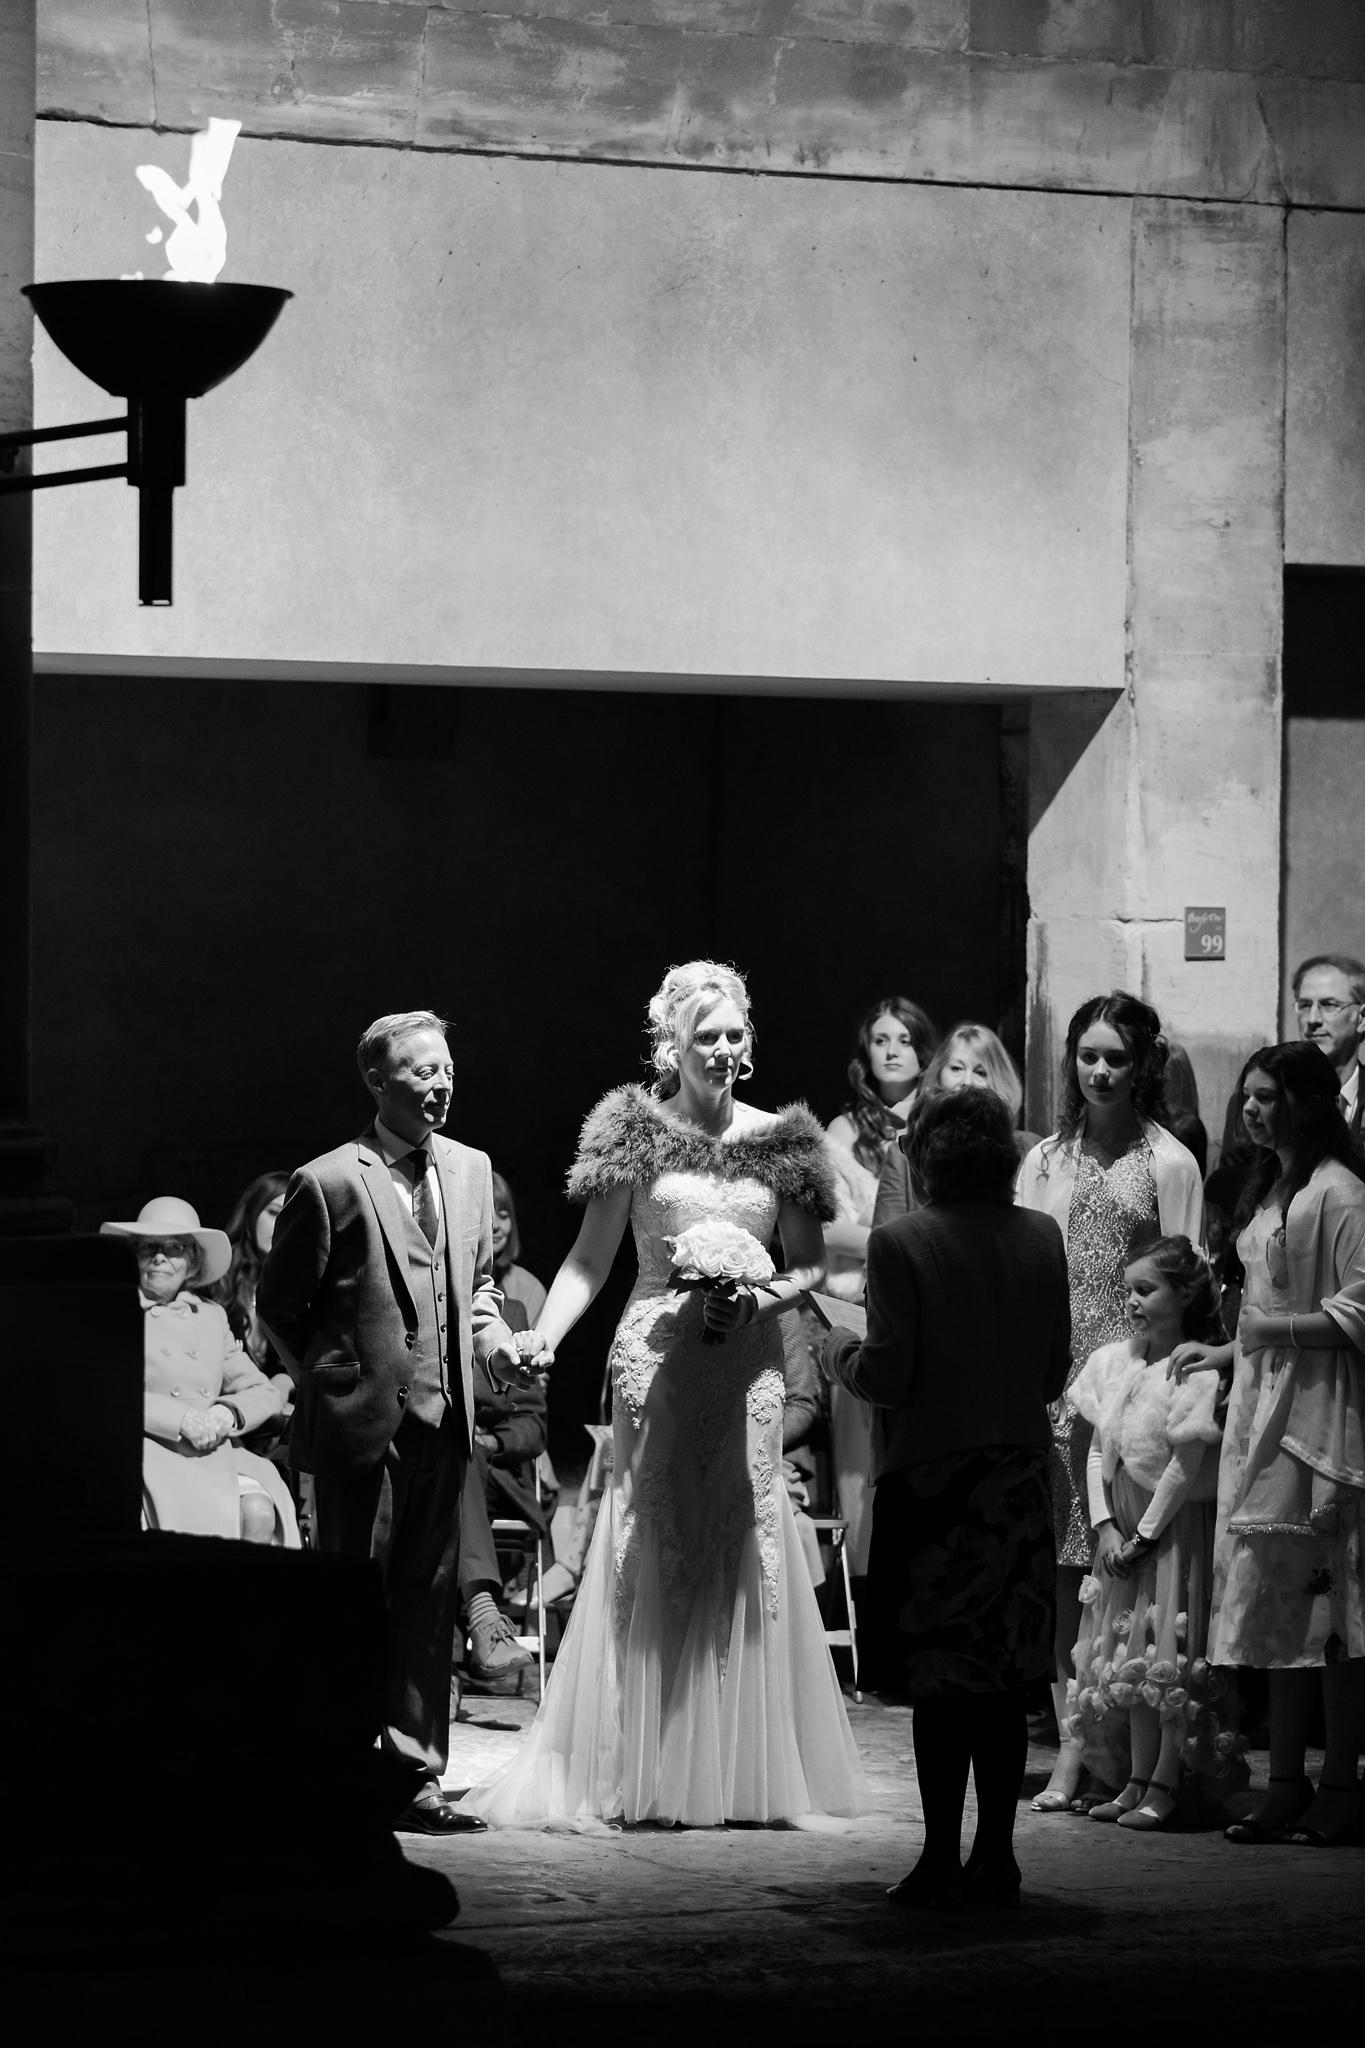 Bride and groom at wedding ceremony in Bath